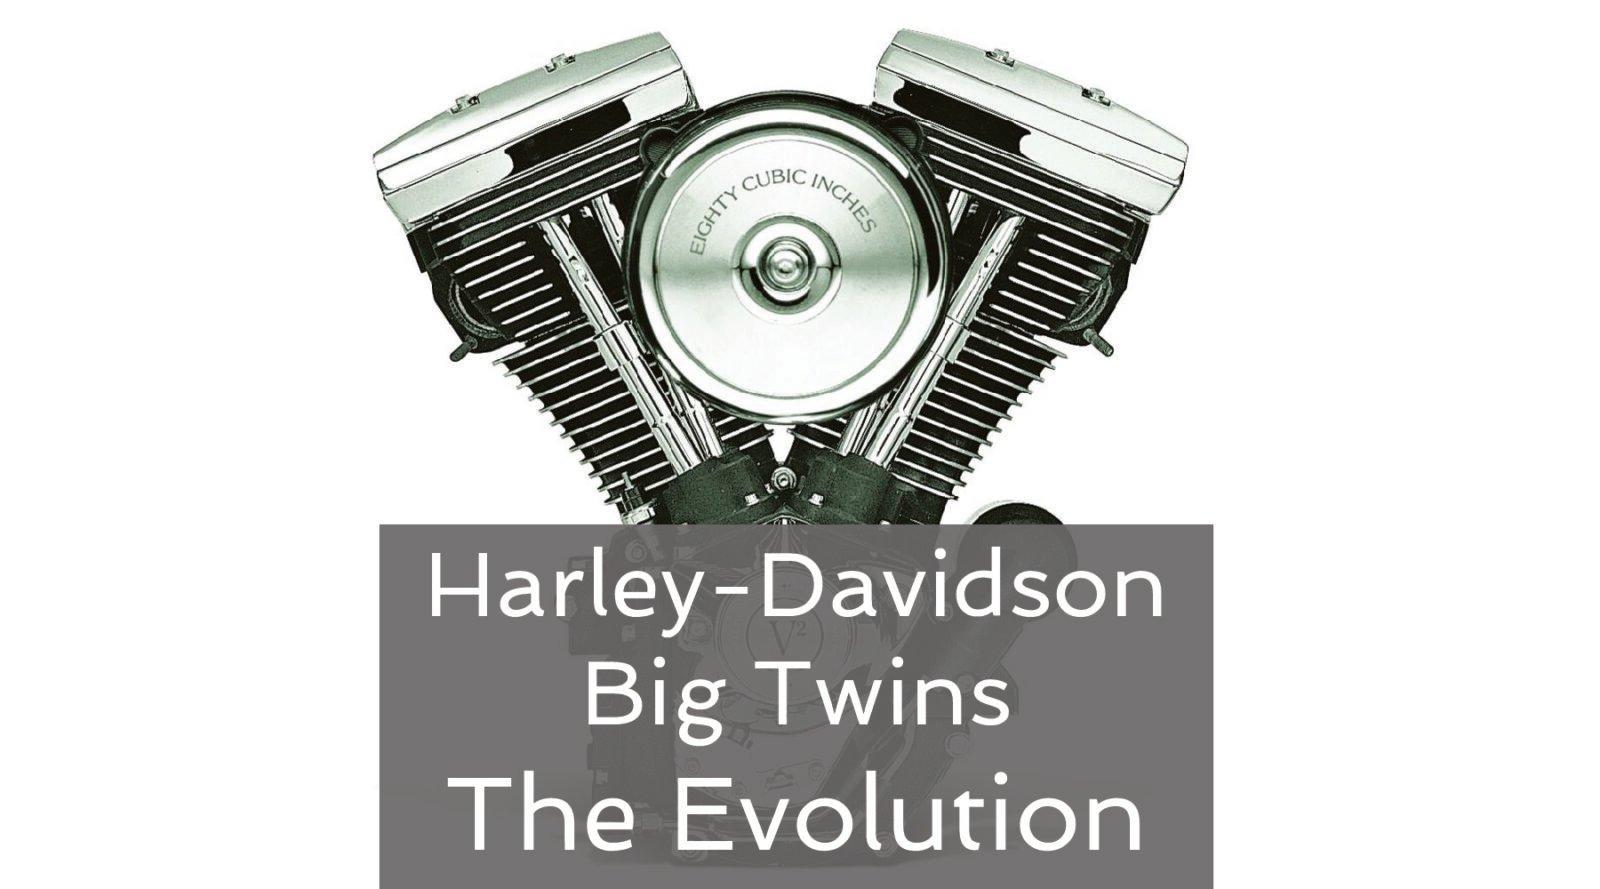 Harley Davidson Evo Evolution Engine V Twin 1600x889 - Harley-Davidson Big Twins – The Evolution